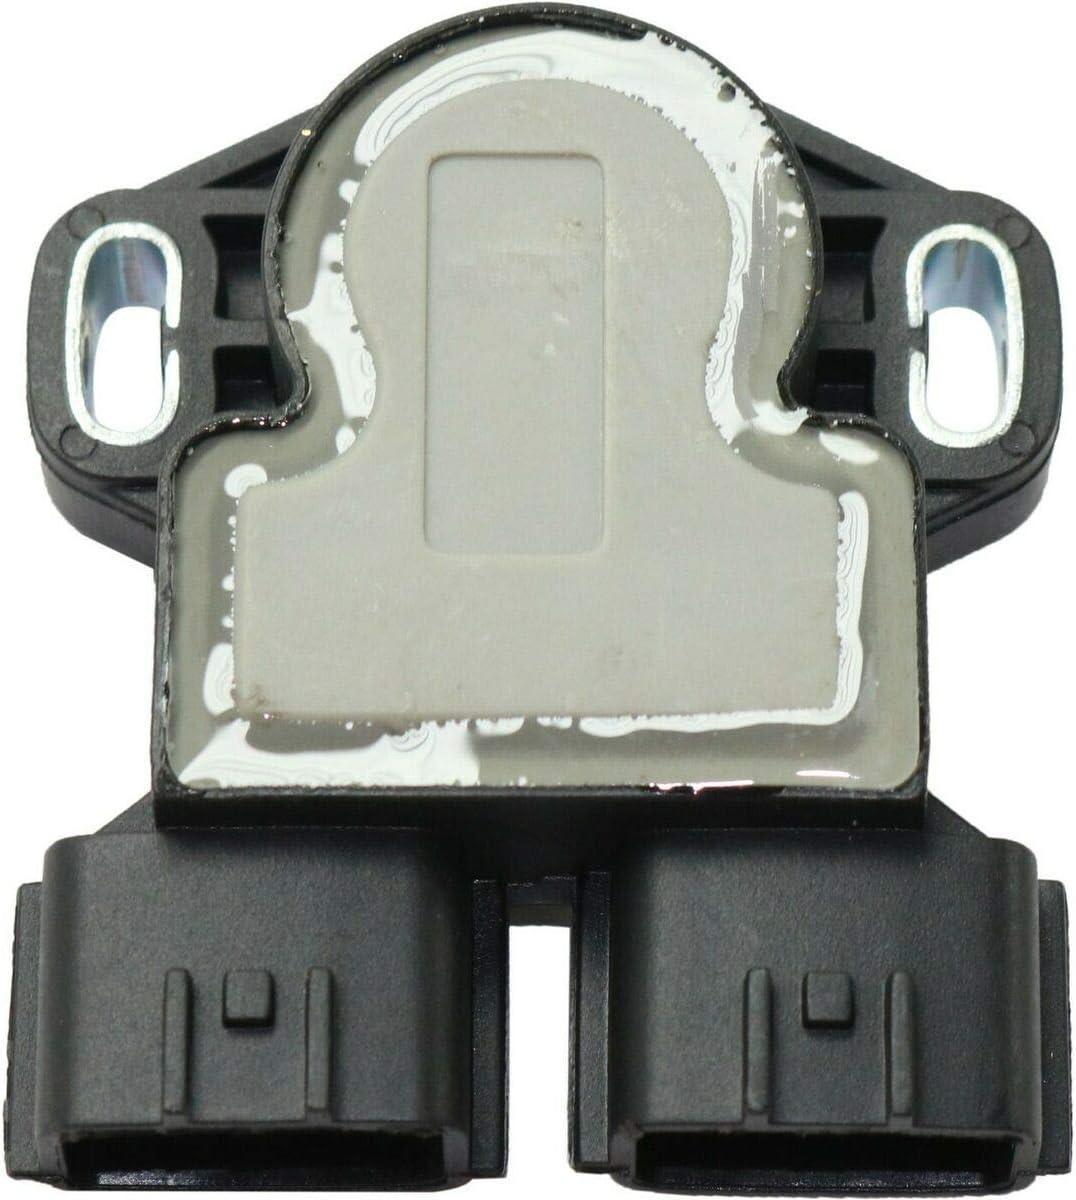 Genuine Sawyer Auto Throttle Position Sensor Tr Omaha Mall Hardbody with Compatible